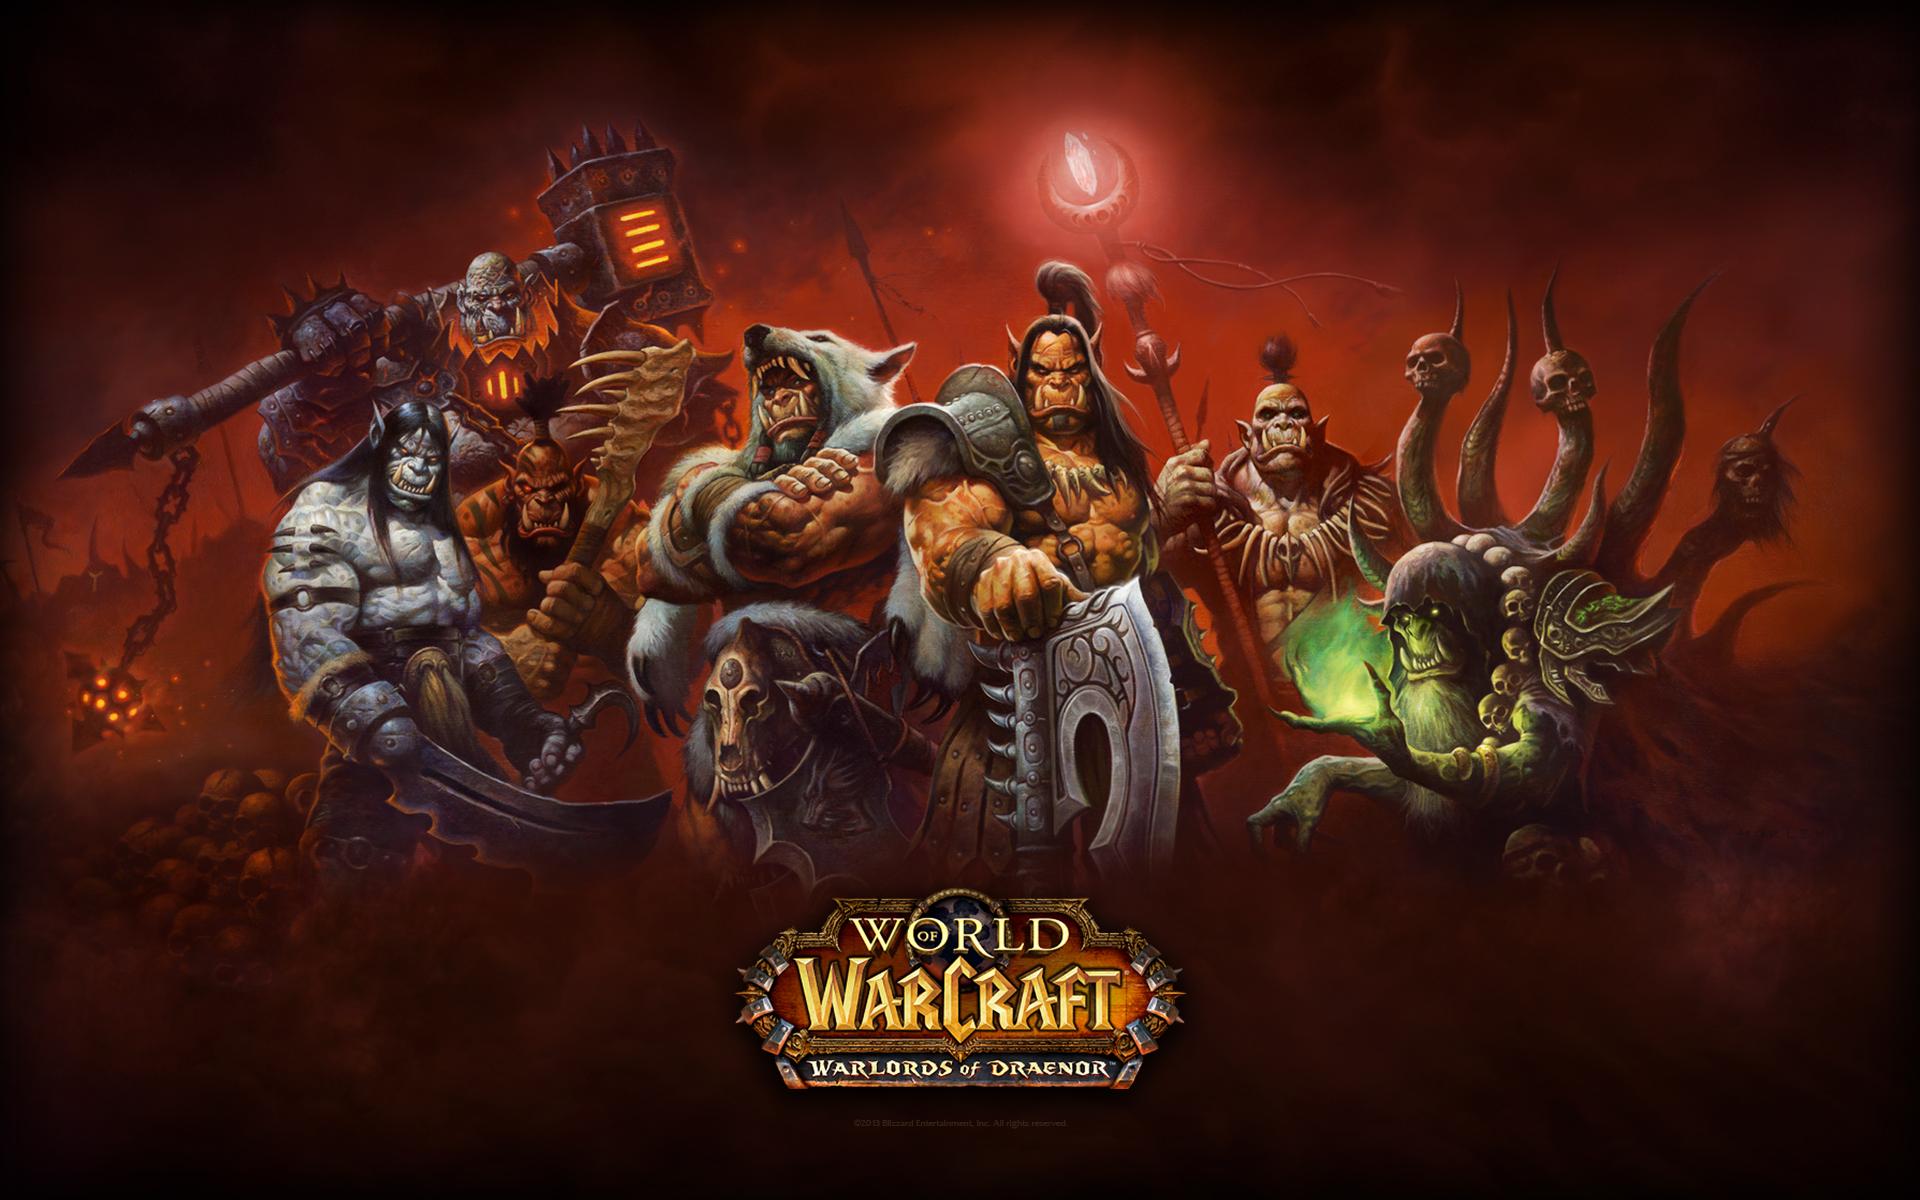 Warlords of Draenor wallpaper